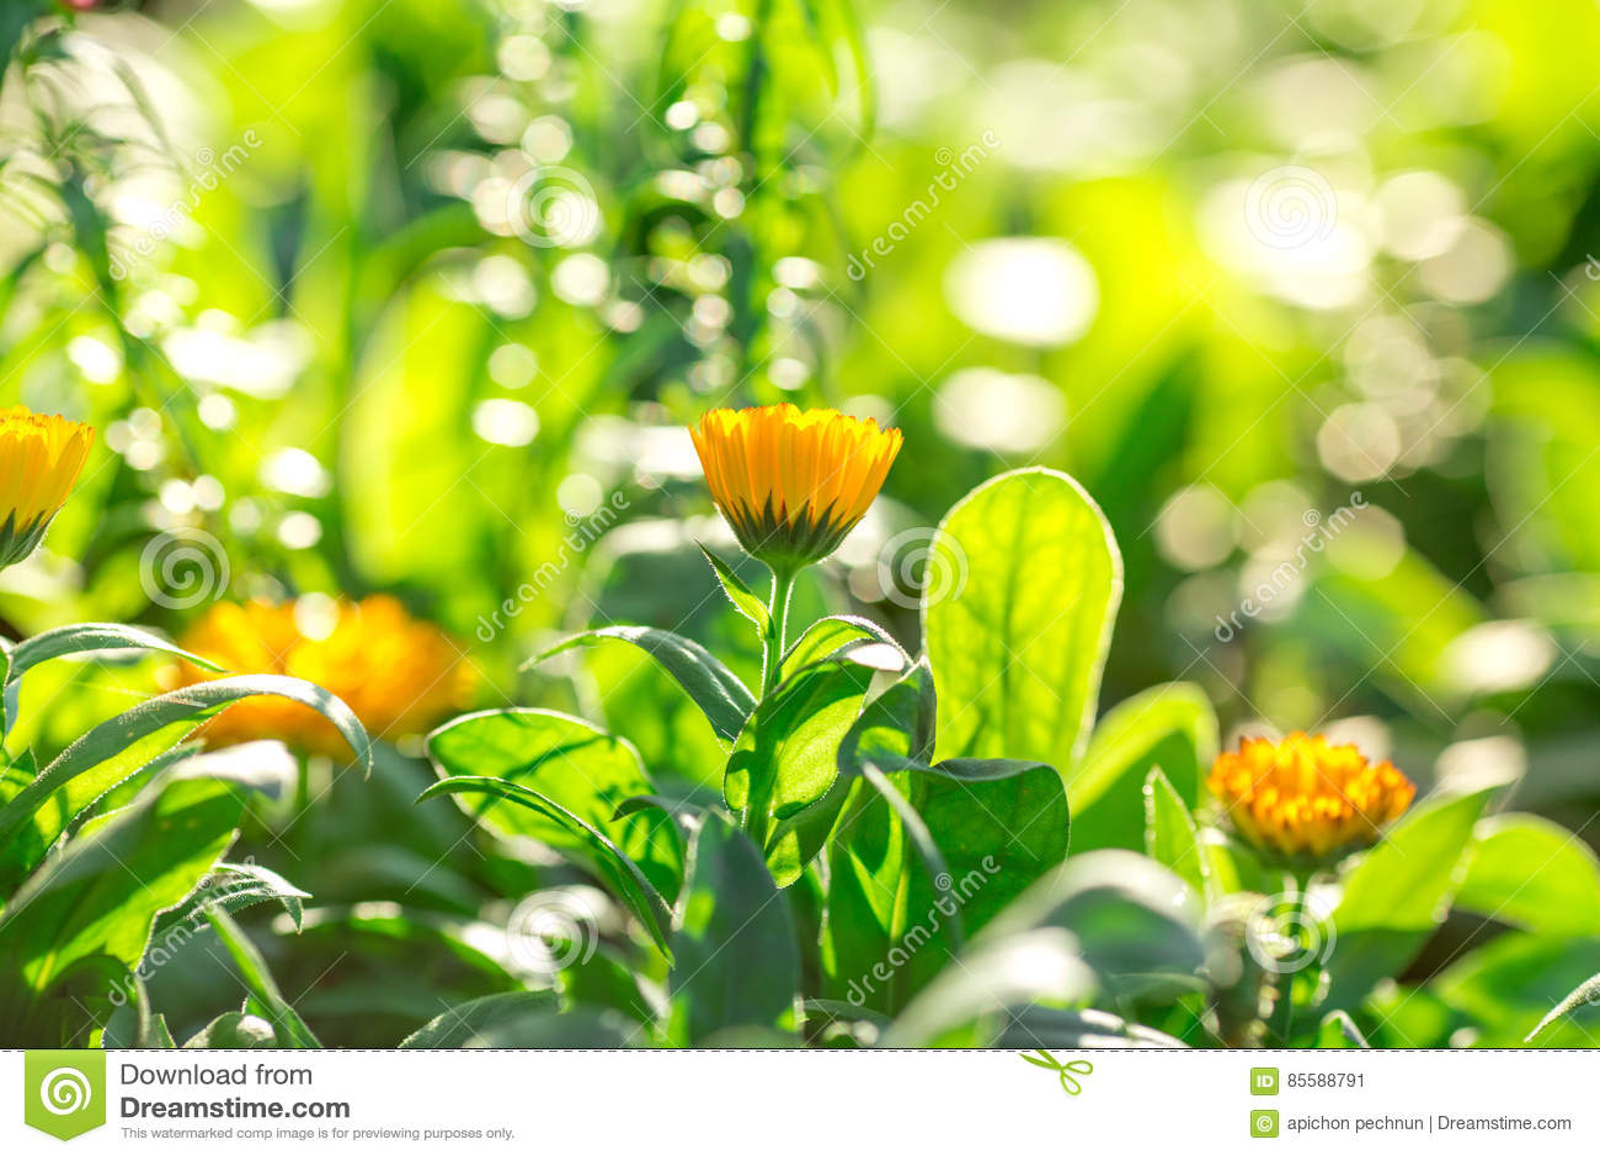 Soft Focus Yellow Flowers Beautiful Stock Image Image Of Nature